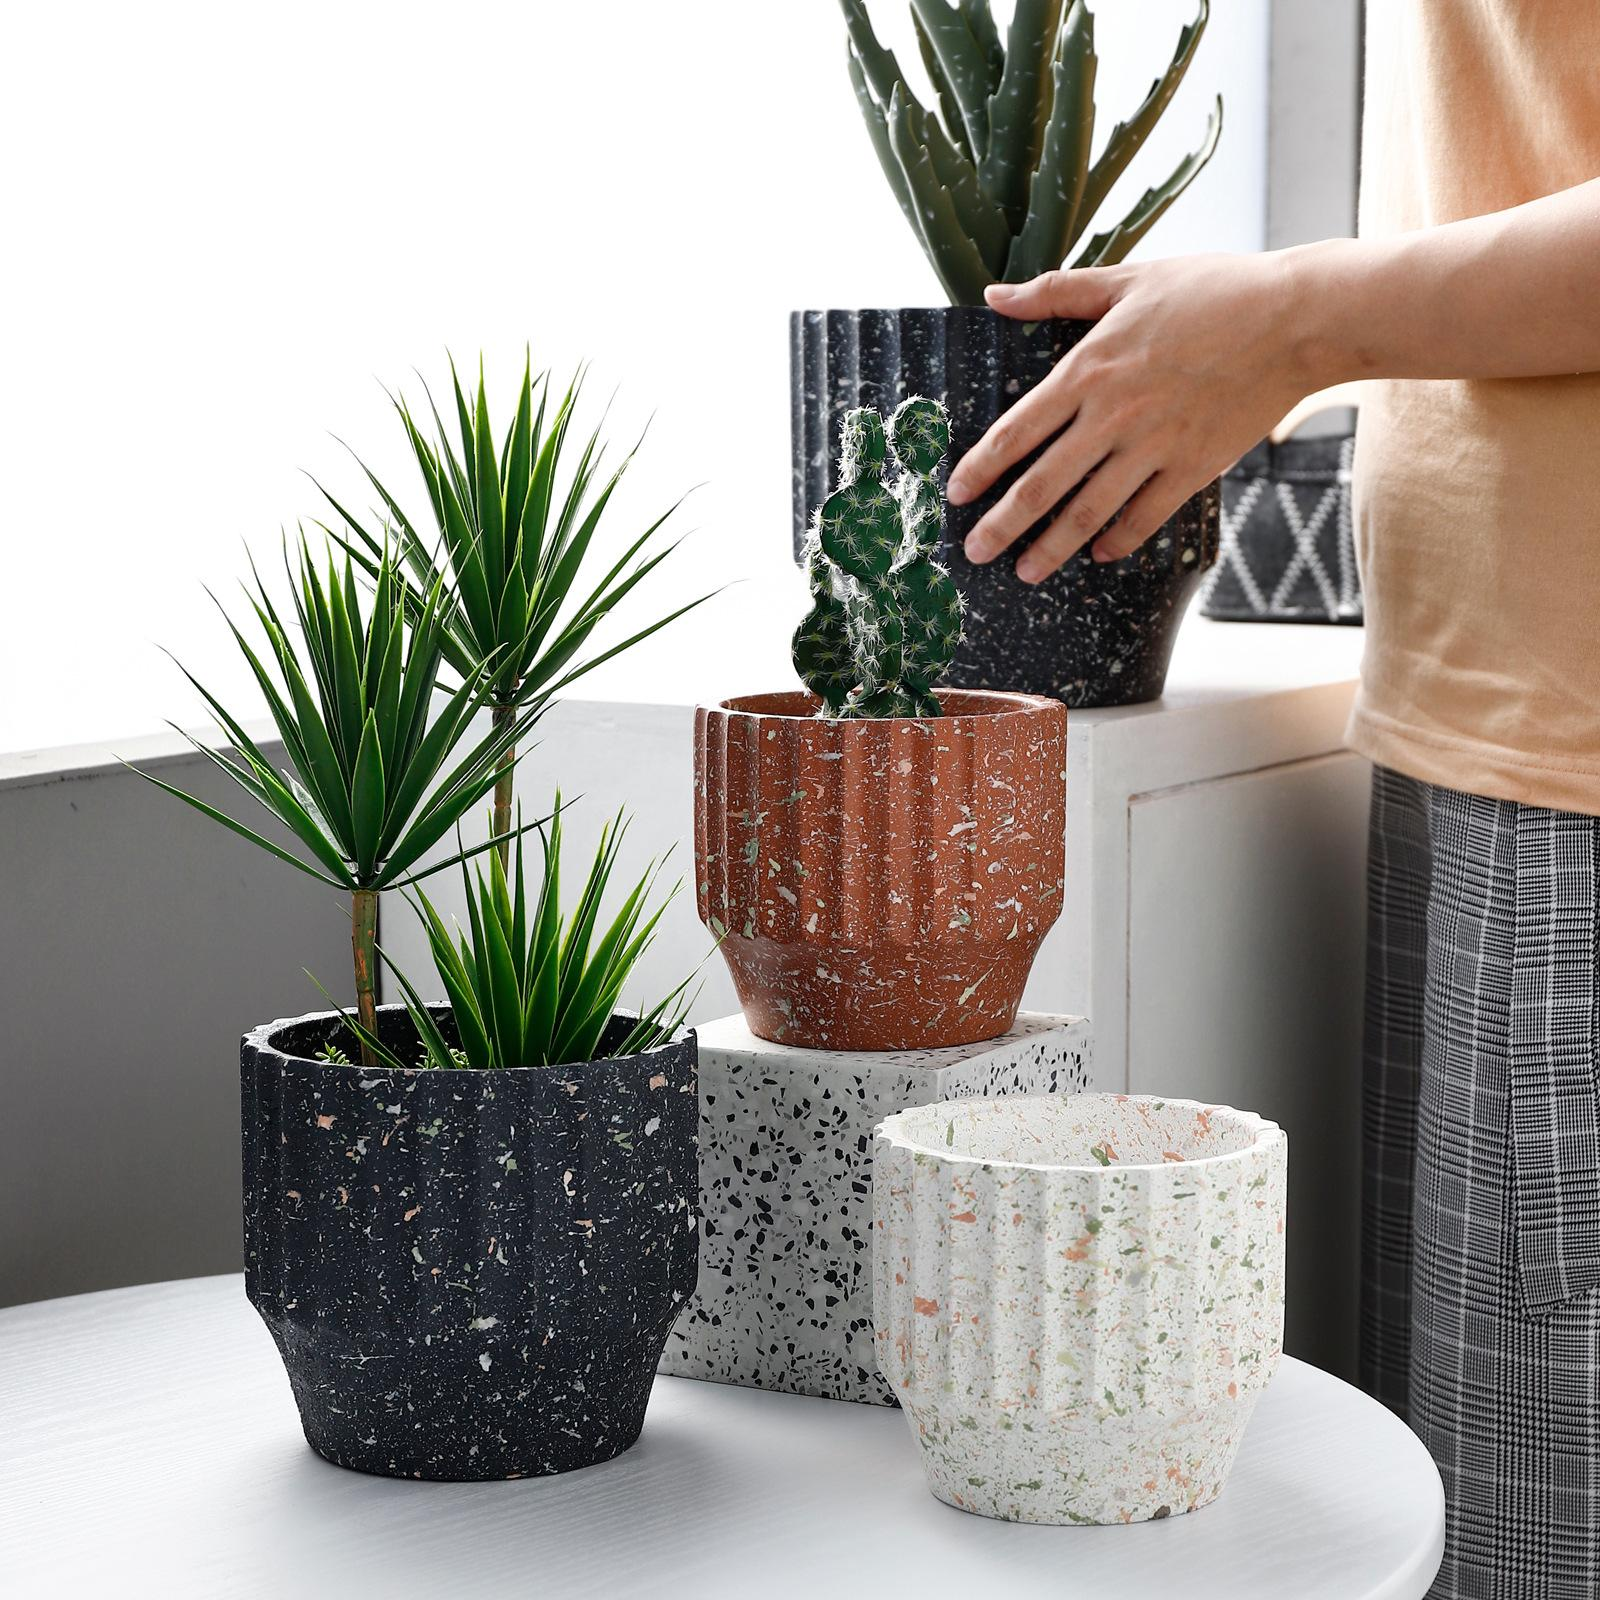 Nordic Terrazzo Design Ceramic Made Flower / Plant Pot / Planter